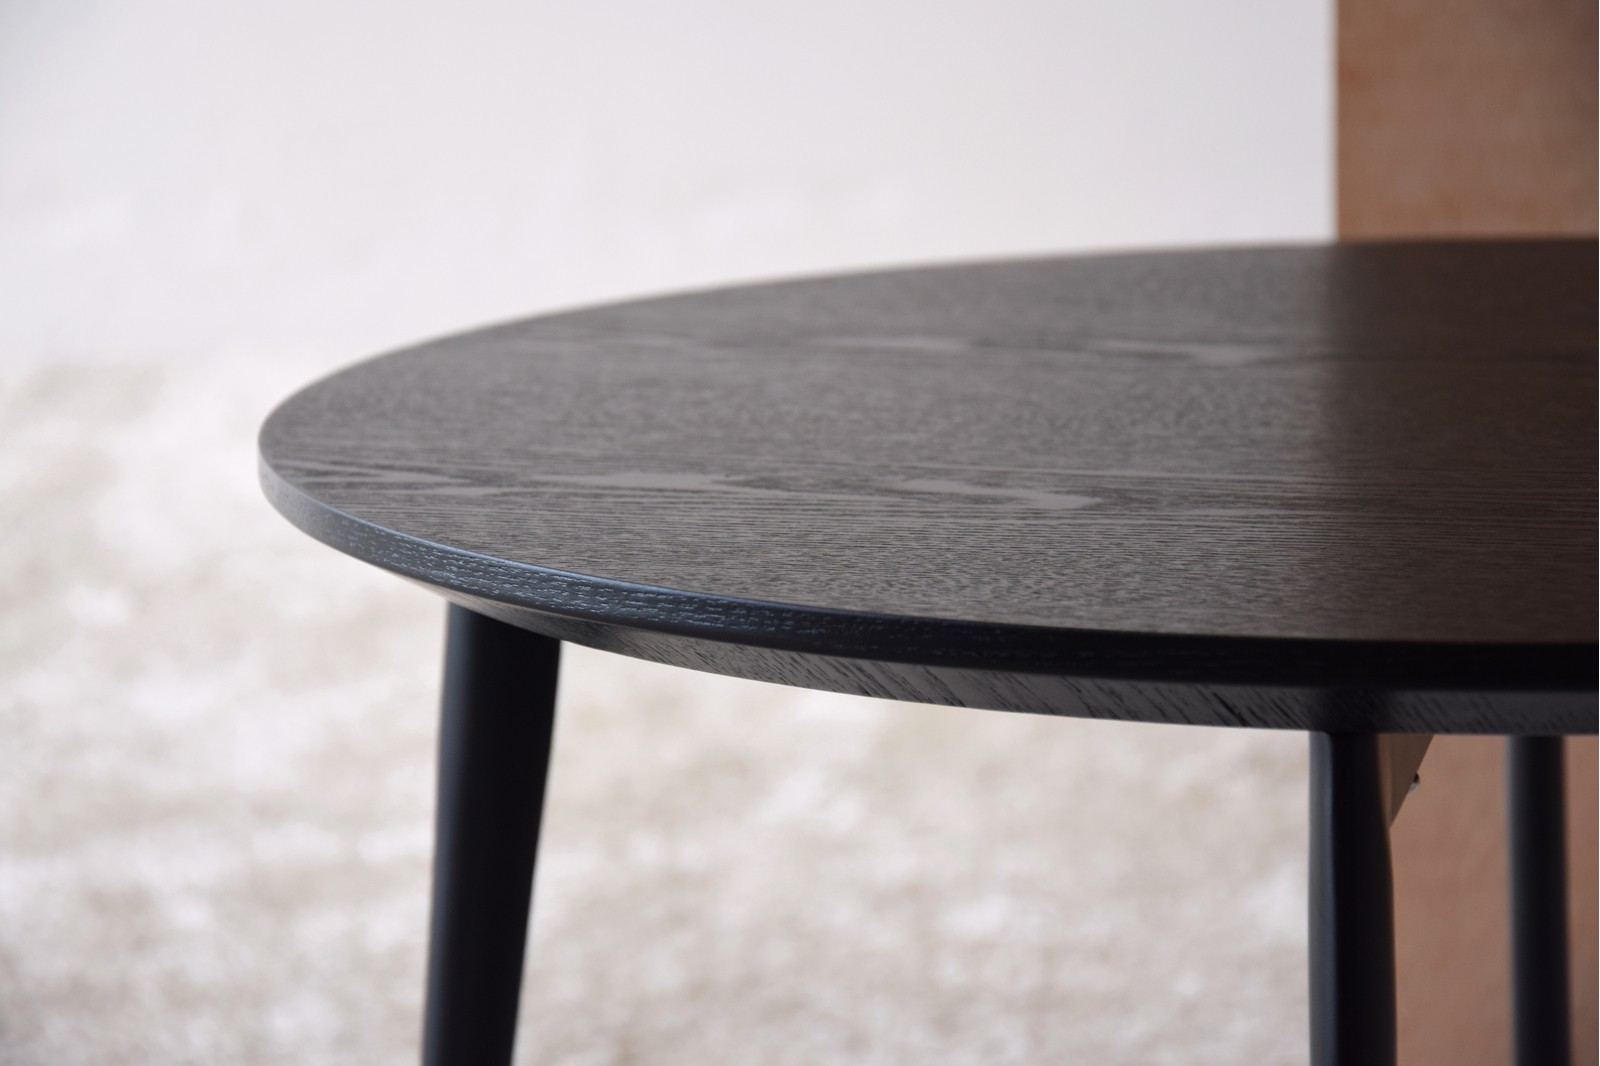 ROUND SIDE TABLE. MATT BLACK ASH VENEER.